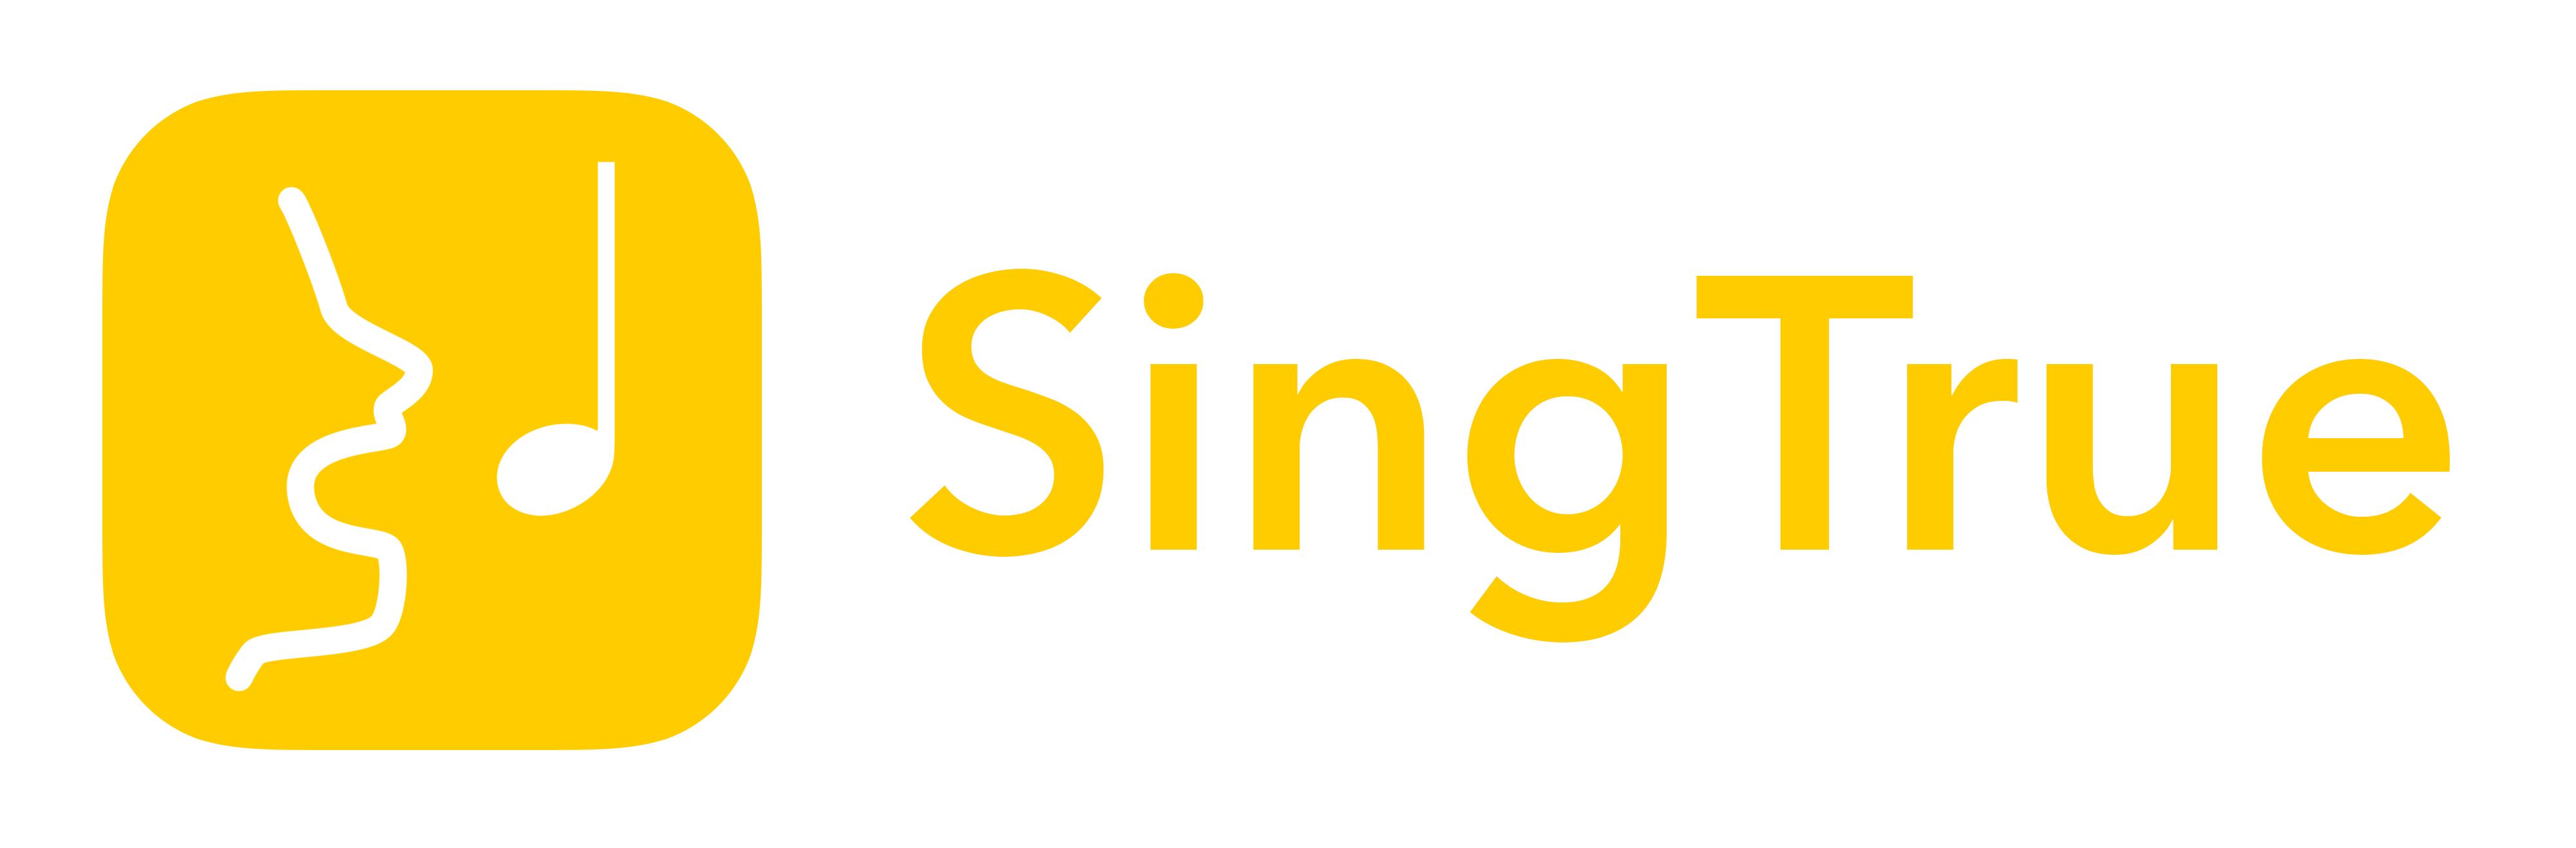 https://www.myfunpianostudio.com/wp-content/uploads/2014/10/SingTrue-logo-with-name.png